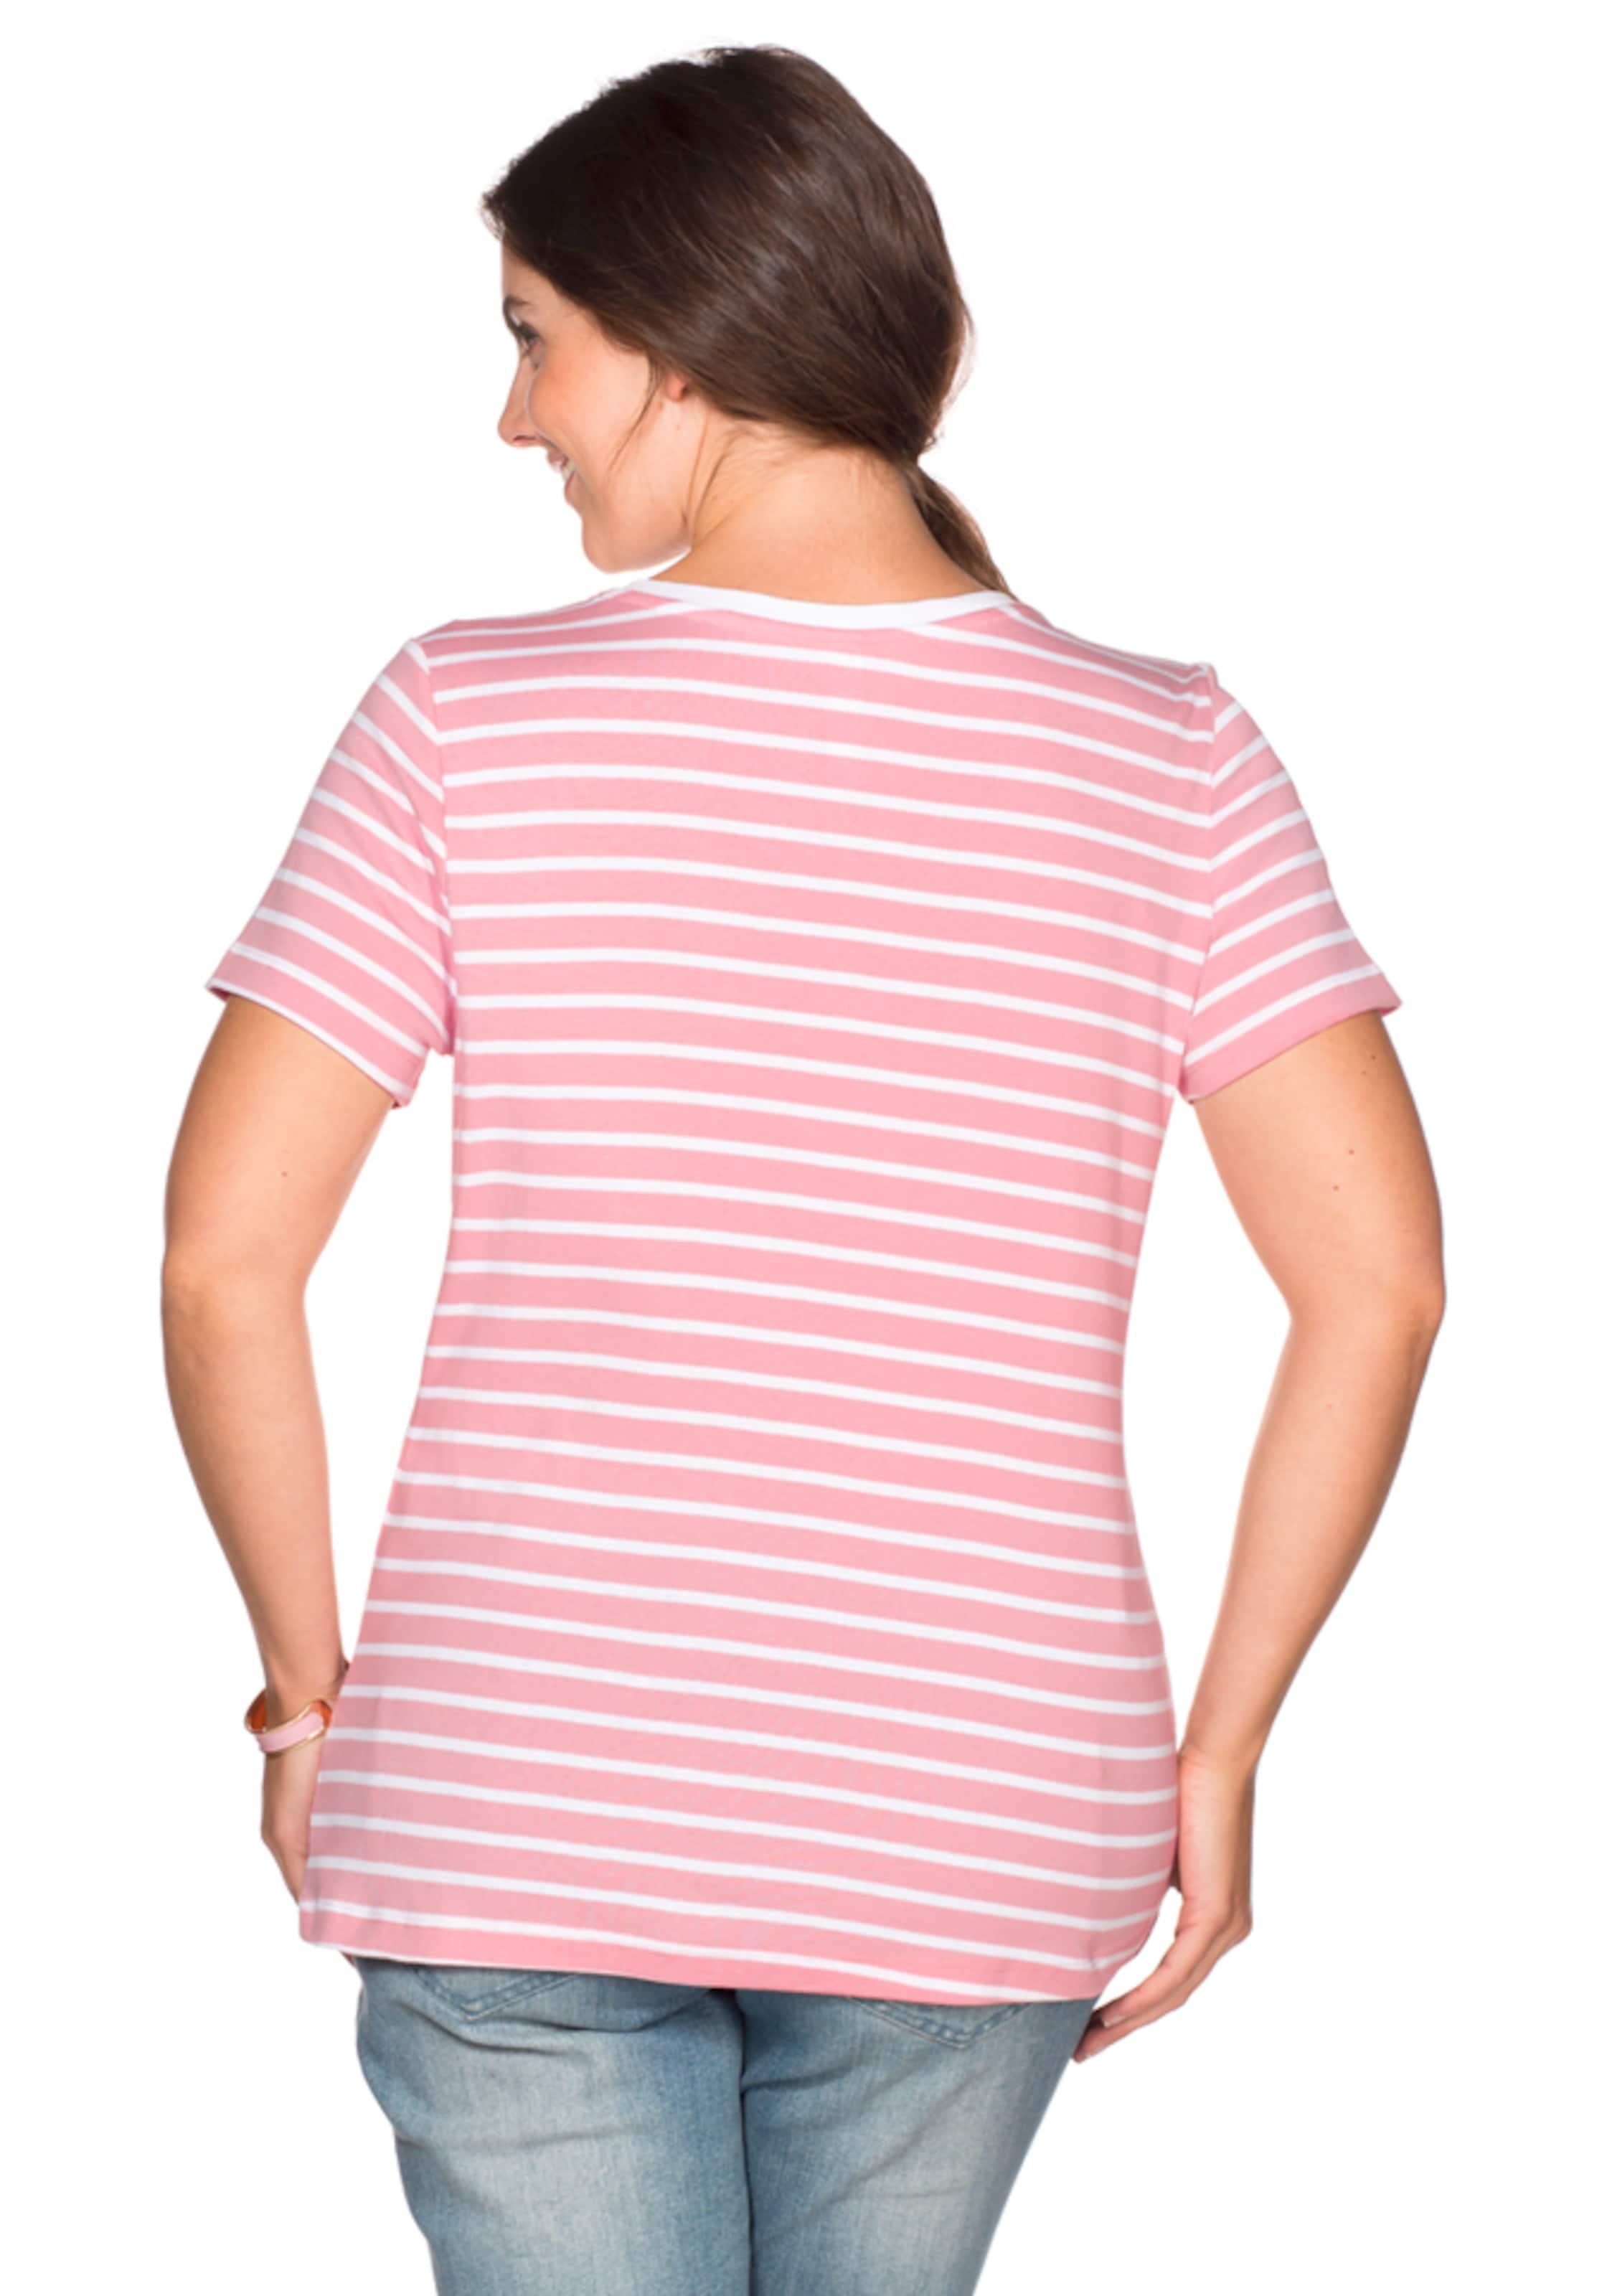 sheego casual Casual Basic T-Shirt V-Ausschnitt Low-Cost Verkauf Online 2018 Neueste Online LpnVnLXEqc